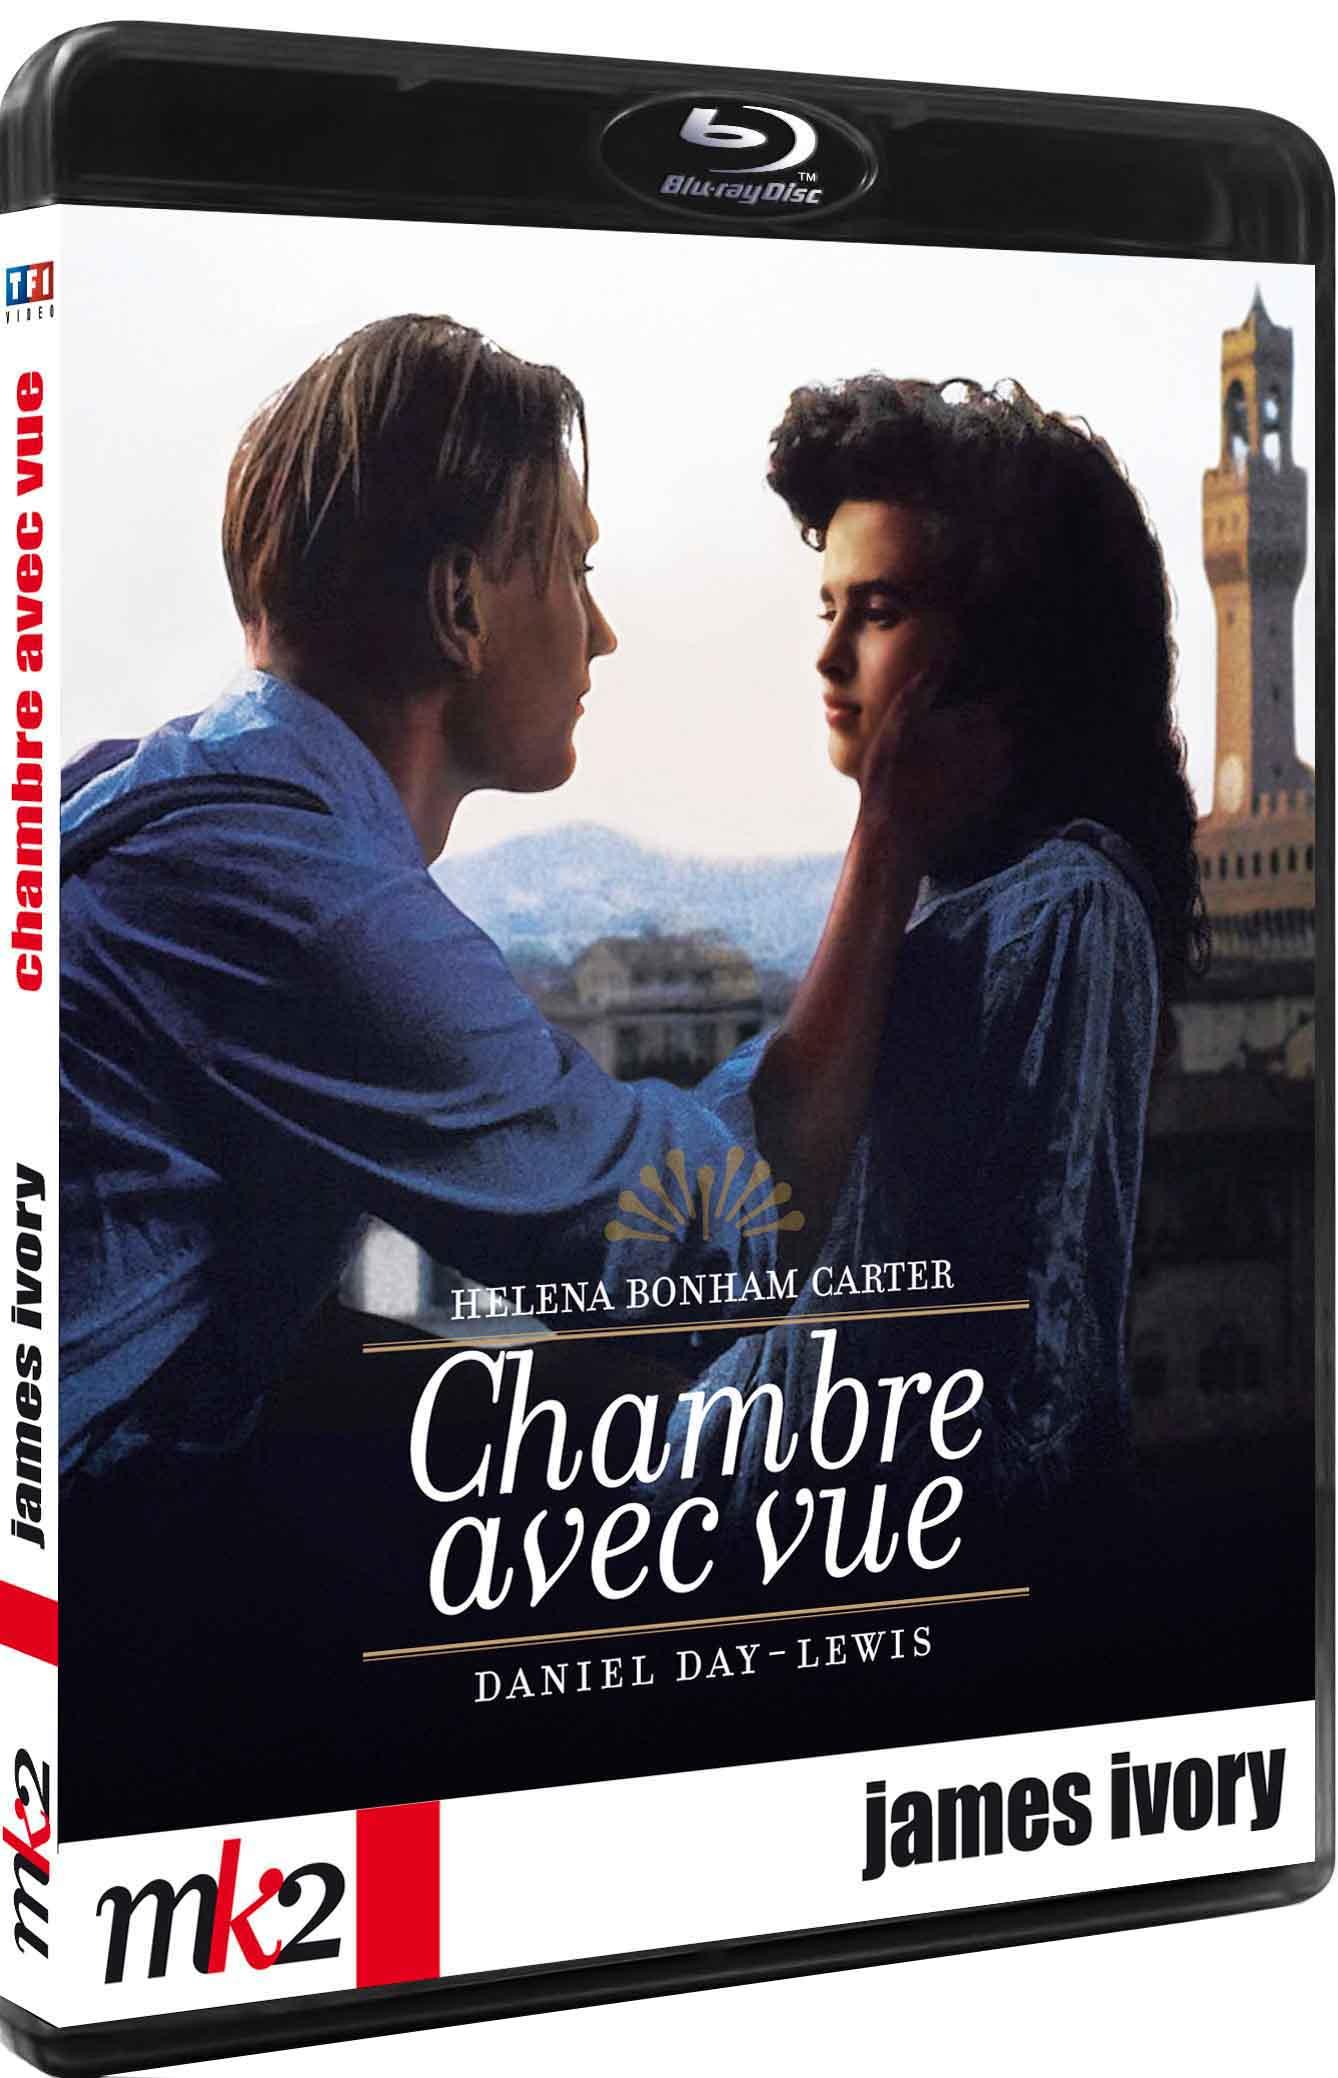 Henri salvador chambre avec vue mp3 320kbps site de for Chambre 13 film marocain telecharger